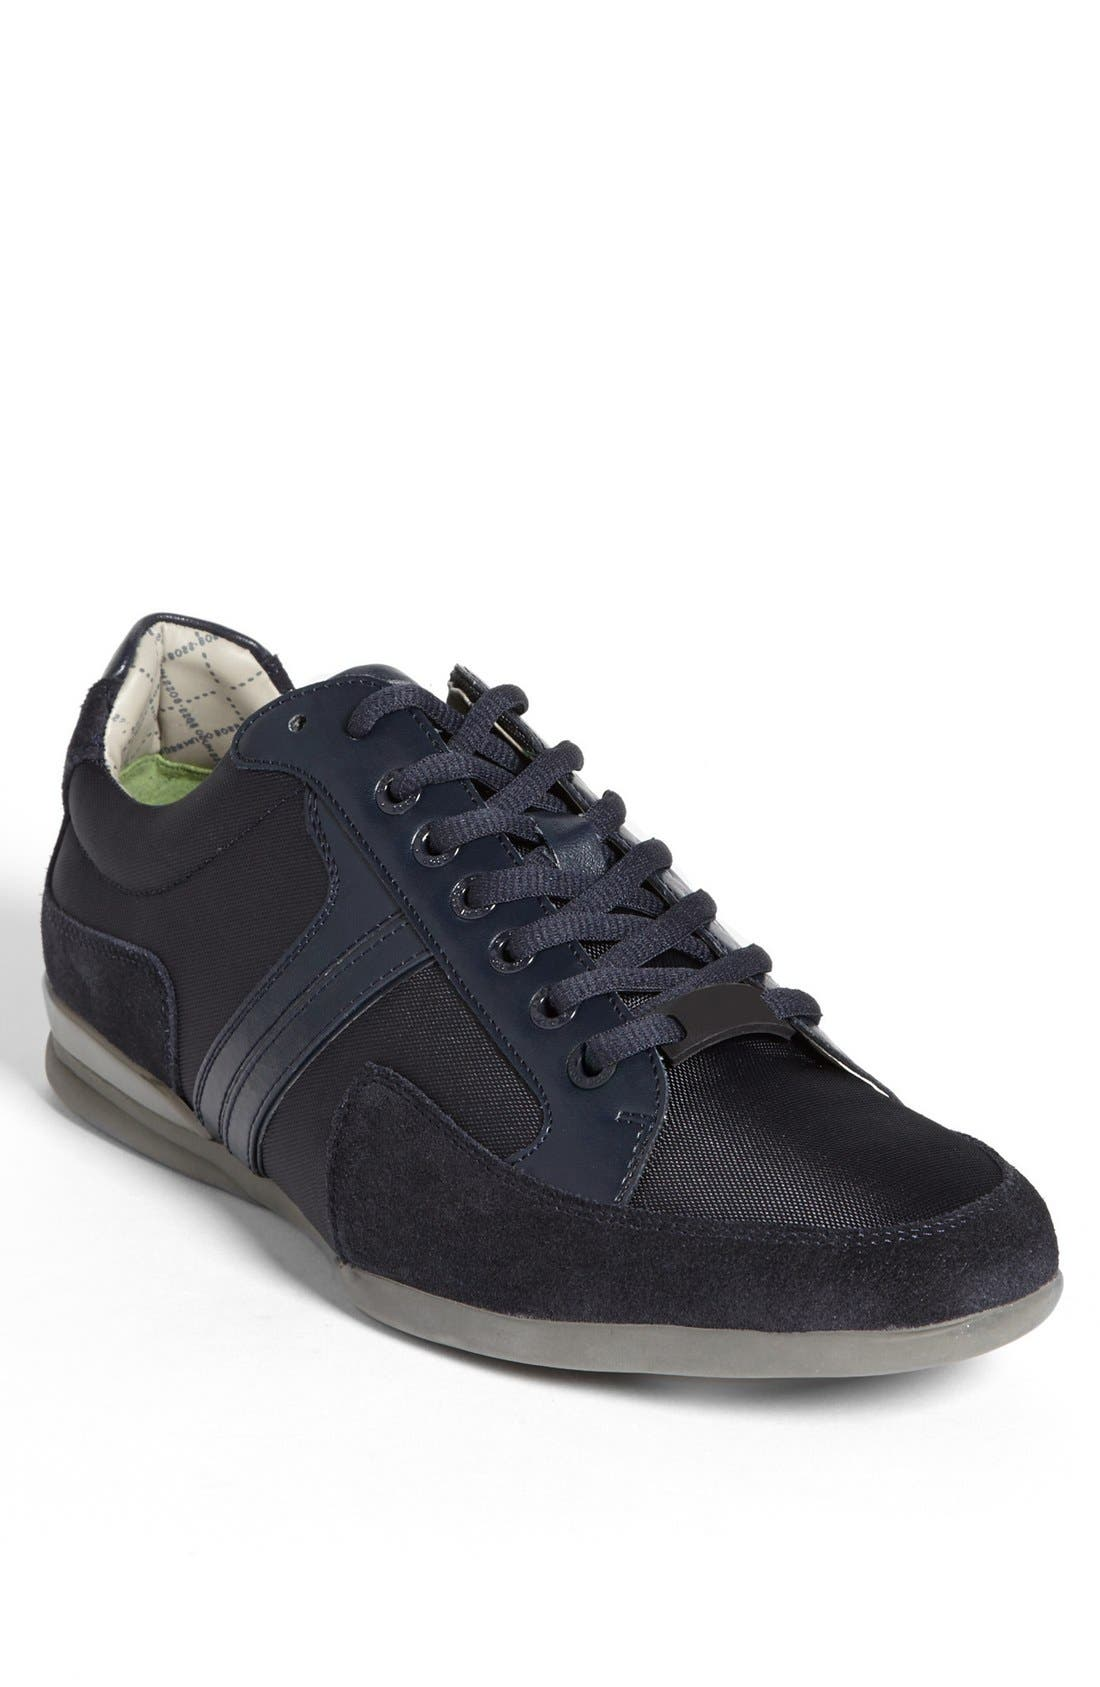 Alternate Image 1 Selected - BOSS Green 'Spacit' Sneaker